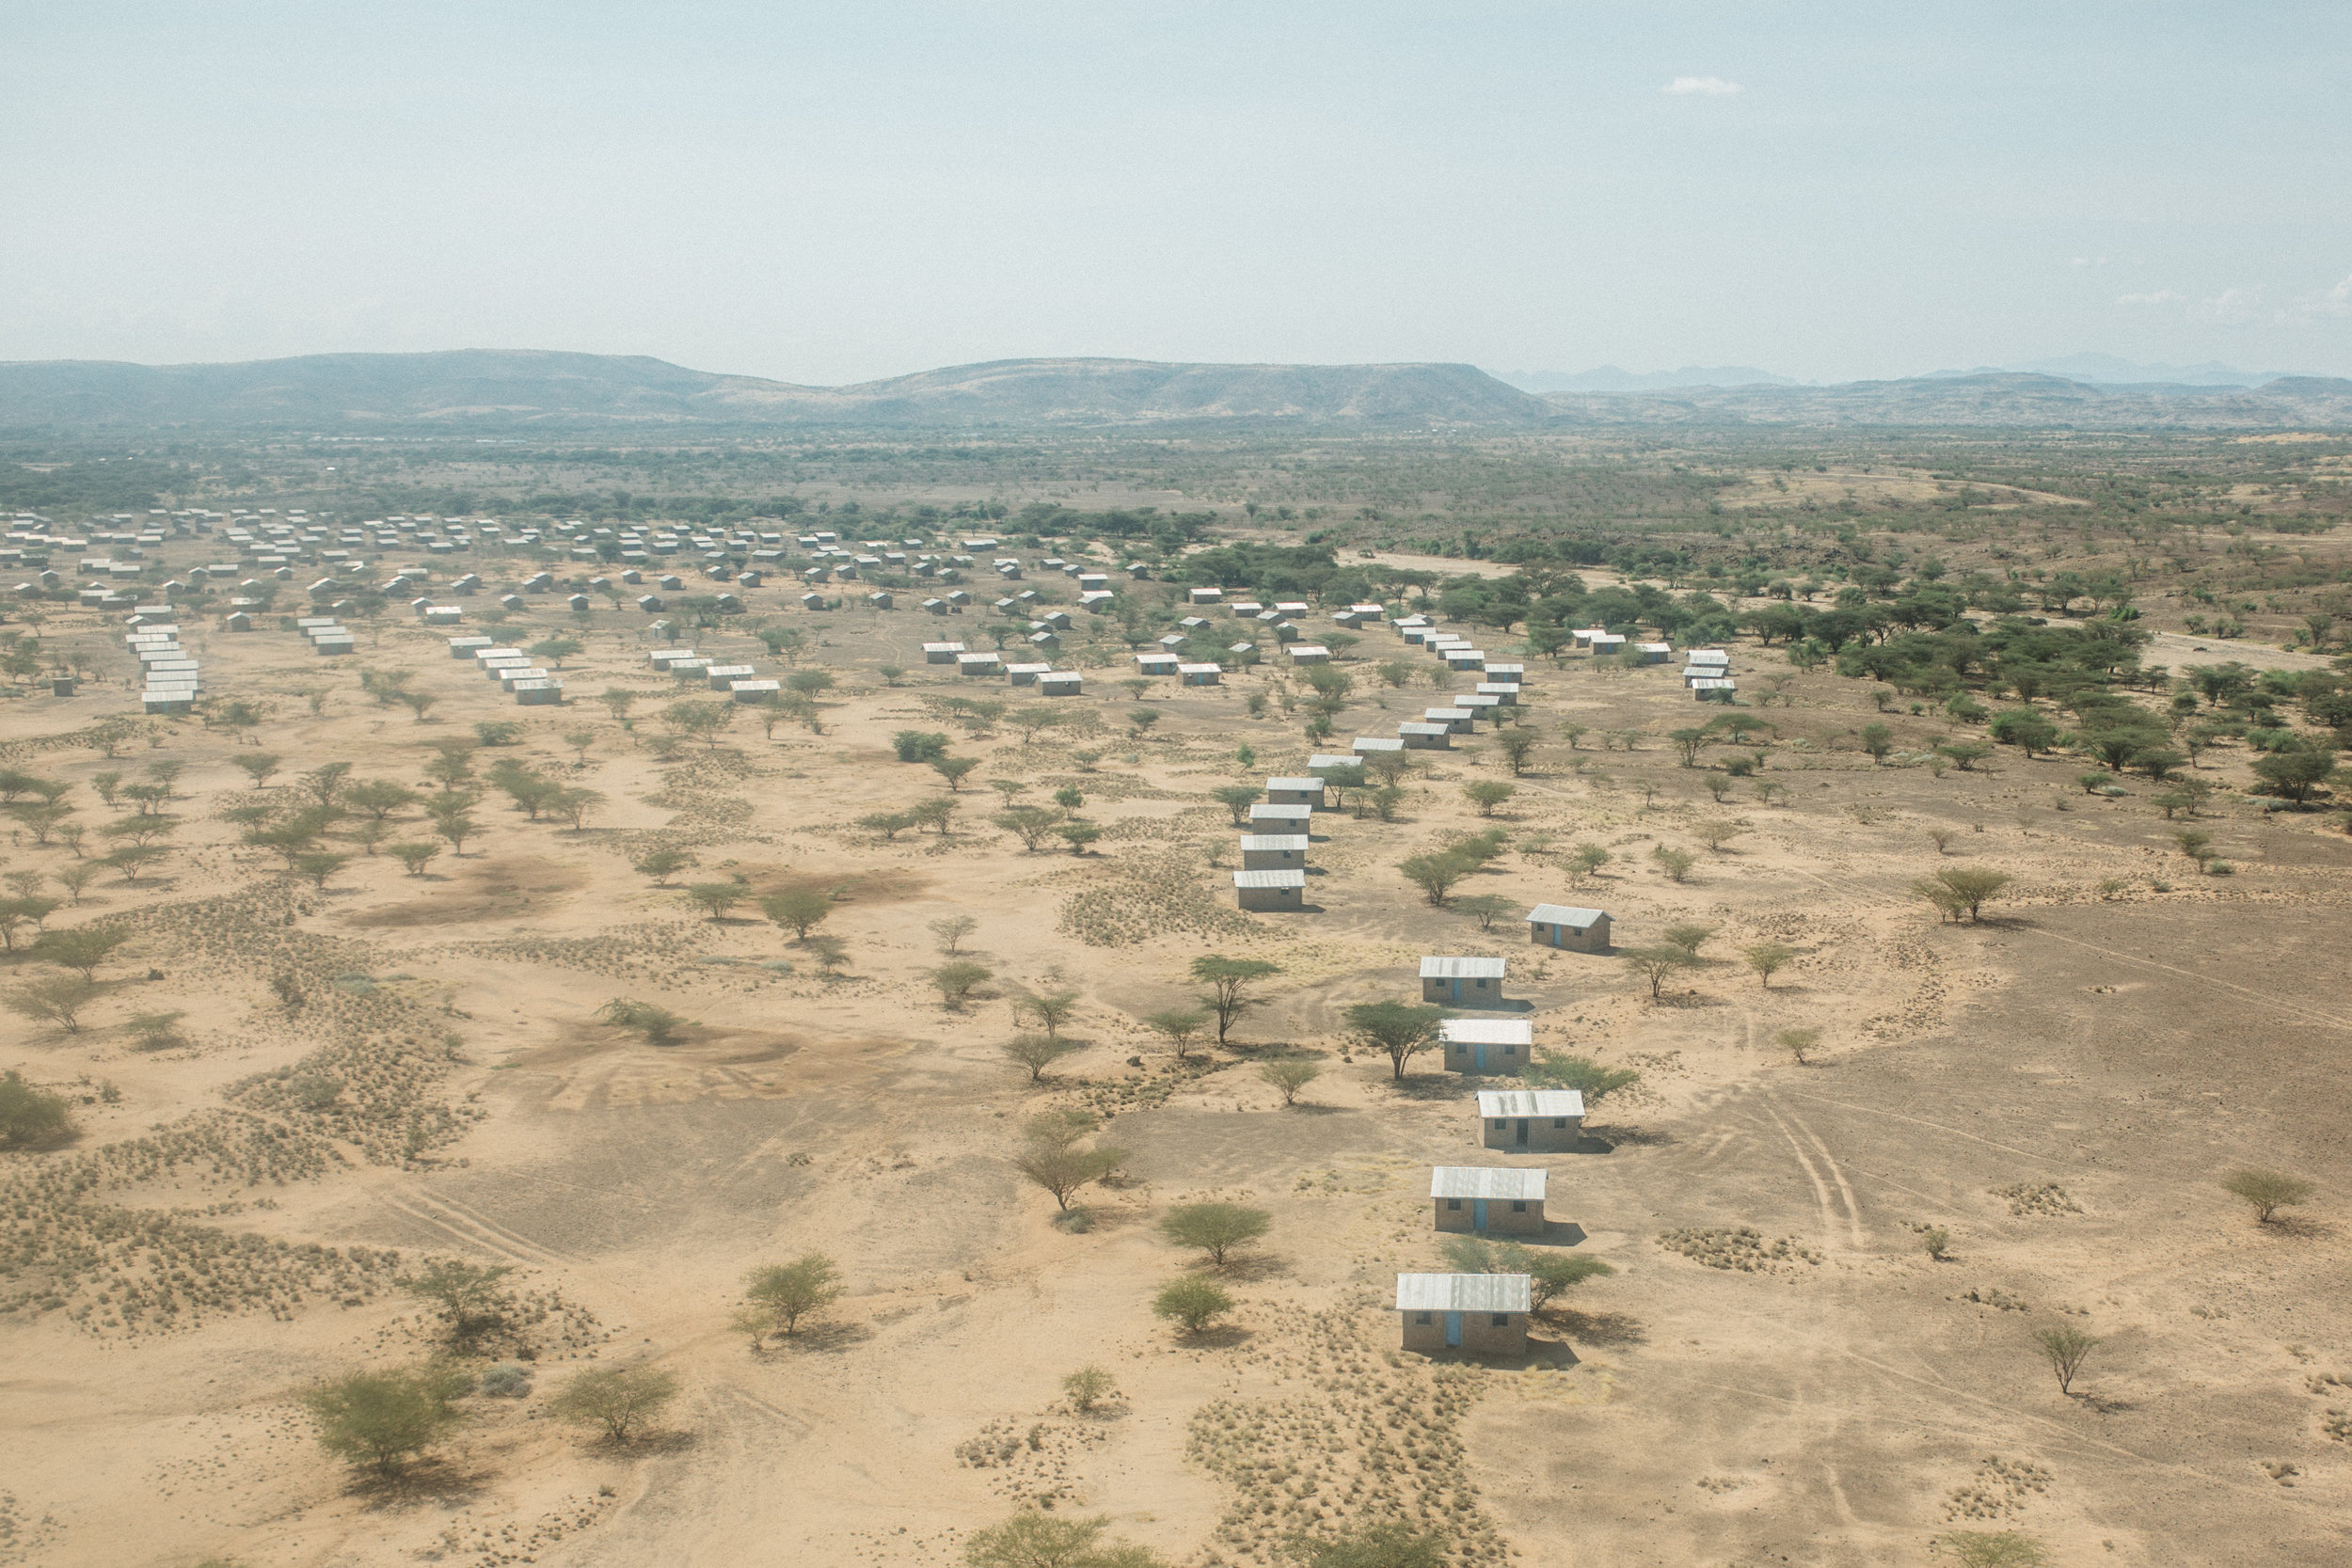 Lokori, Turkana from above.